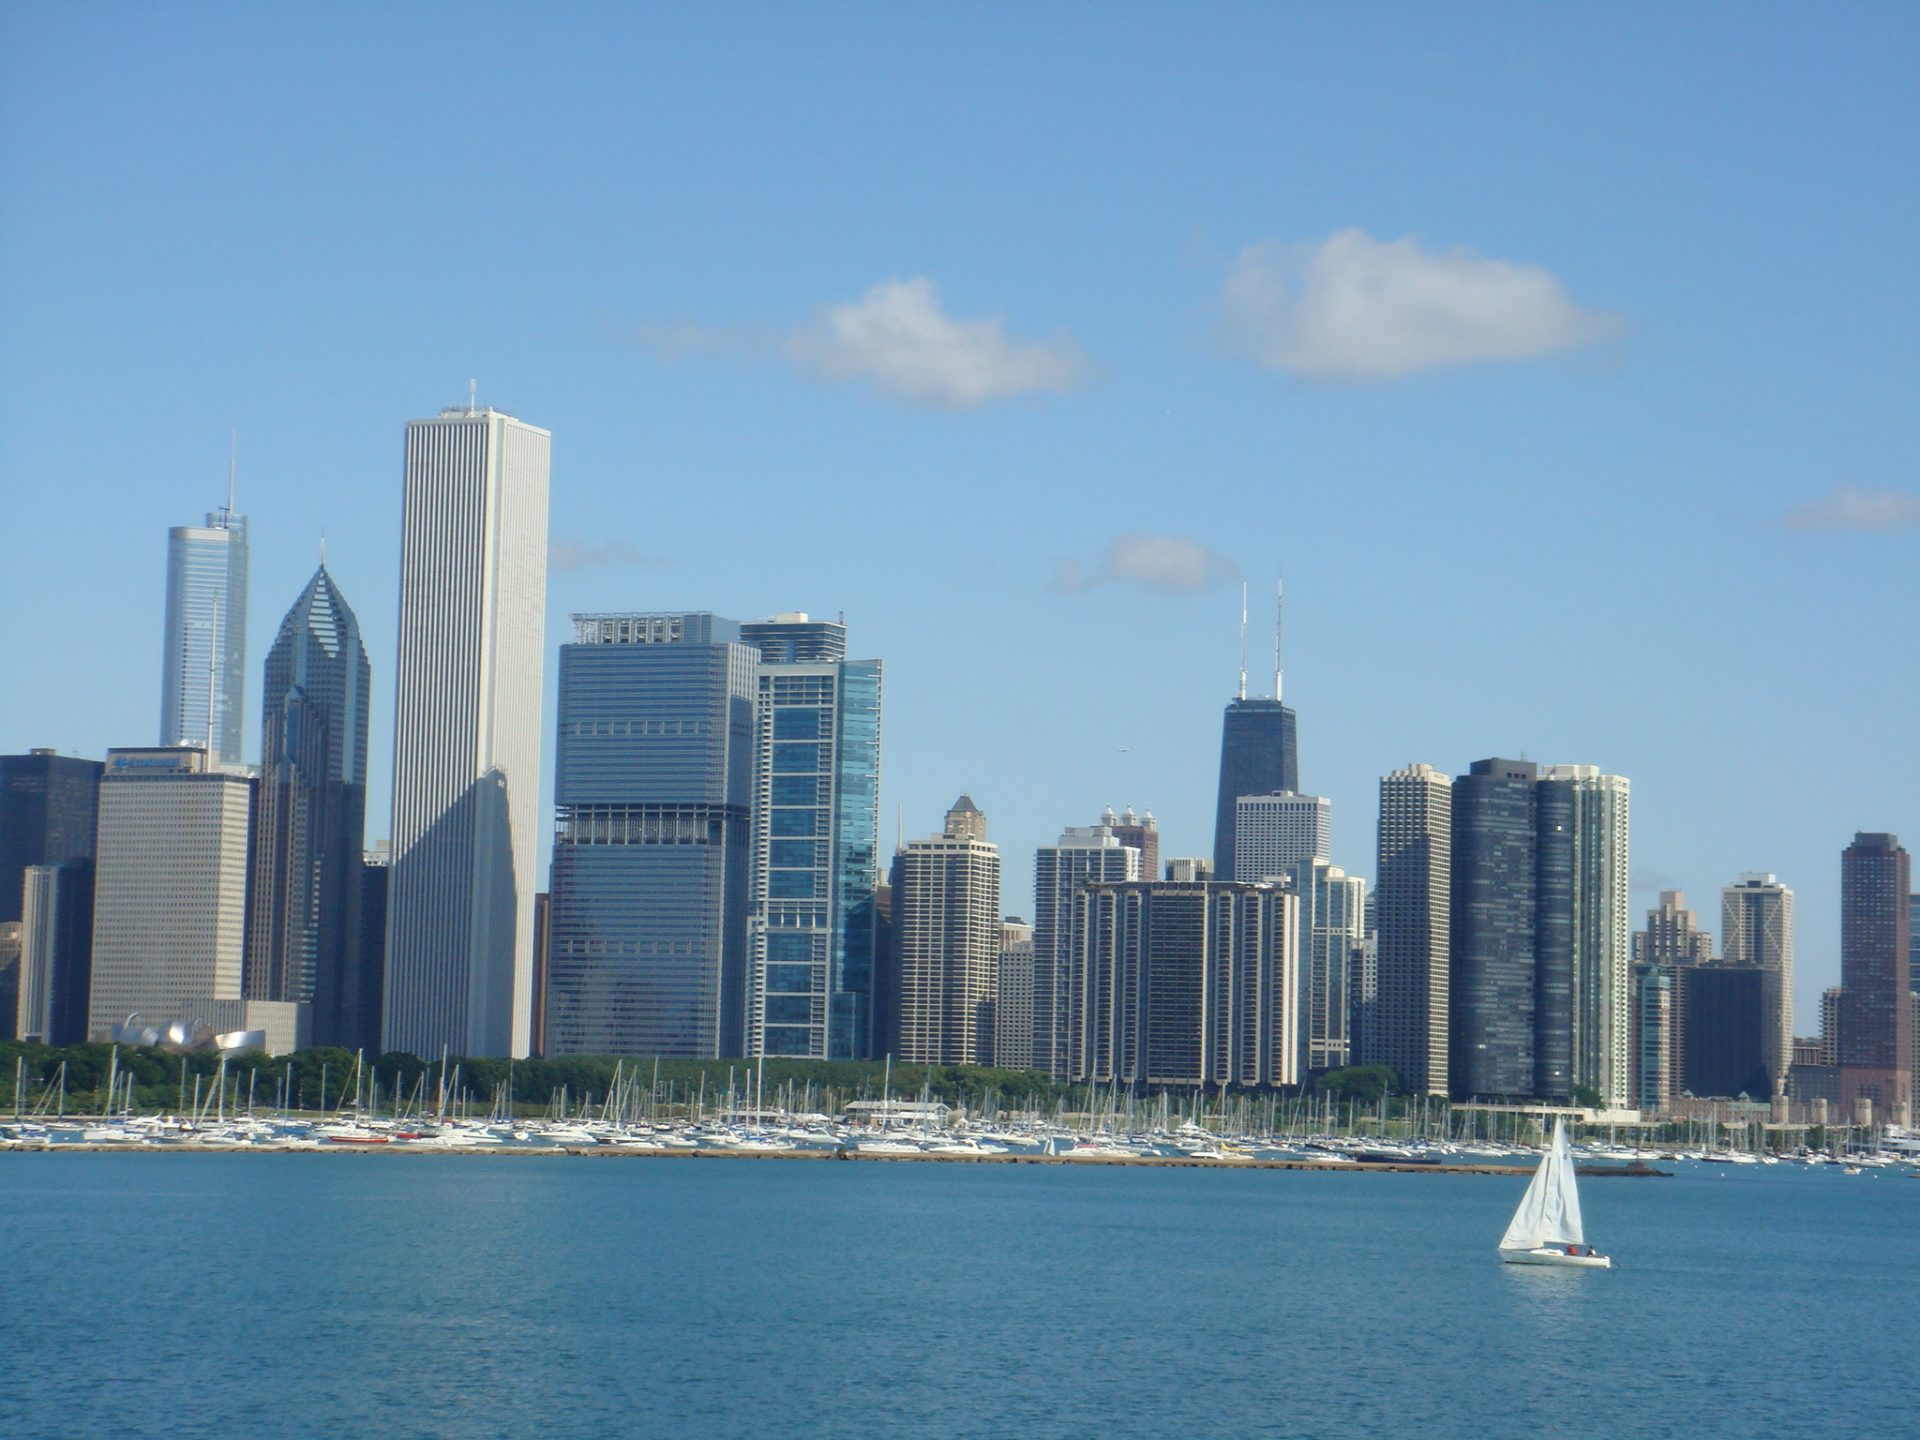 Chicago's breathtaking lakefront